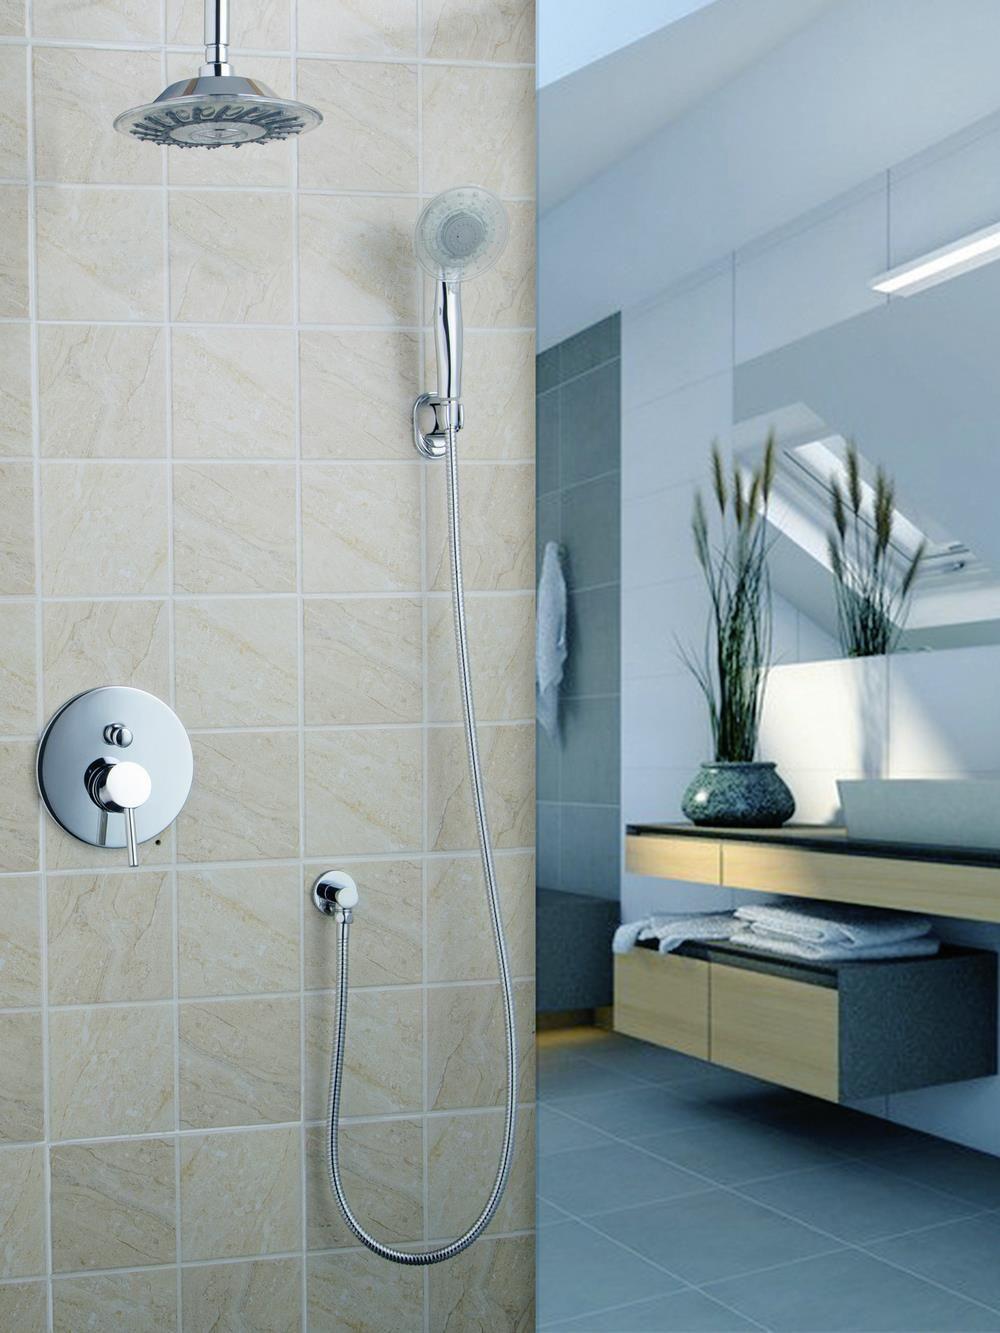 50243 22a Bathroom Wall Mount Chrome 8 Abs Shower Head Brass